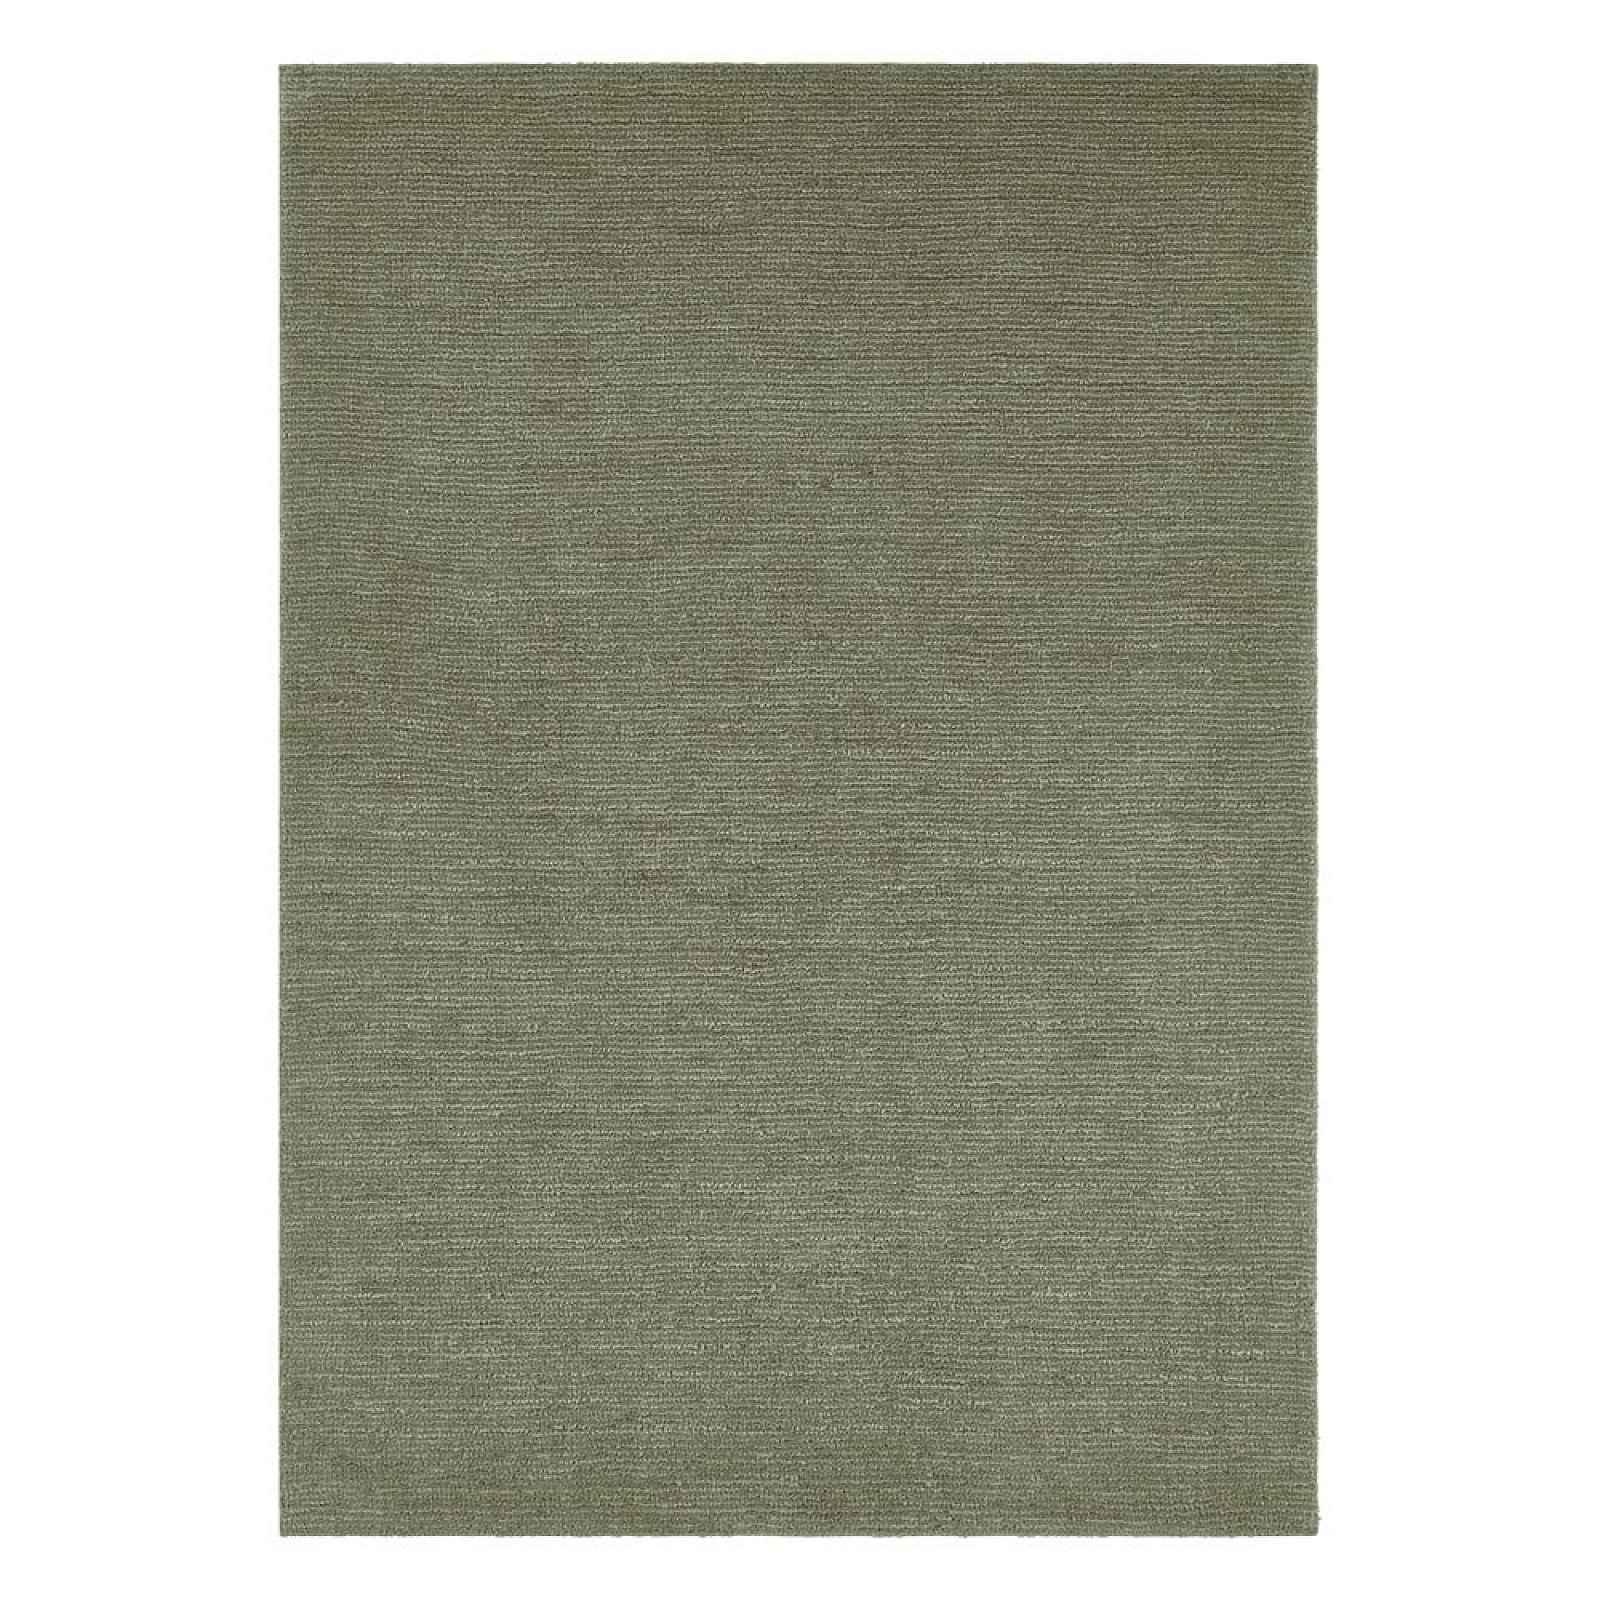 Tmavě zelený koberec Mint Rugs Supersoft, 120 x 170 cm